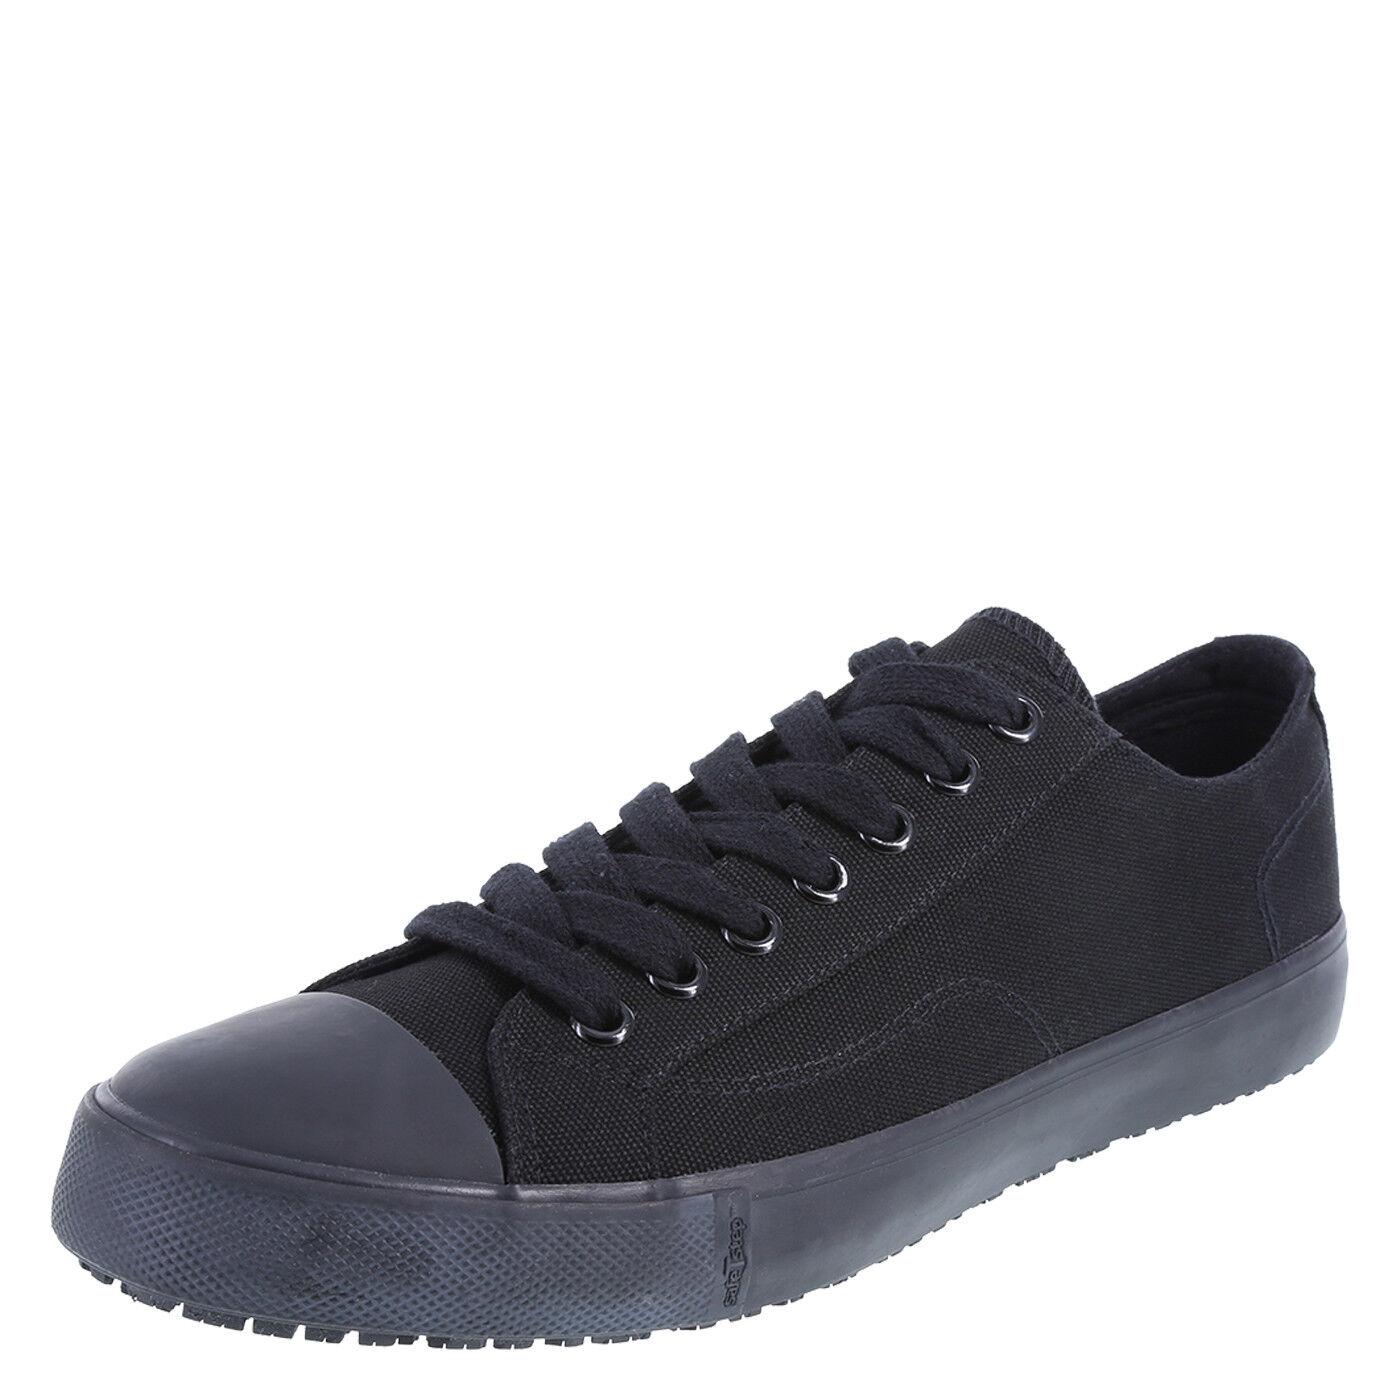 MEN'S SAFE T STEP Black Canvas KICK Slip Resistant SNEAKERS * SZ 14 W New In Box